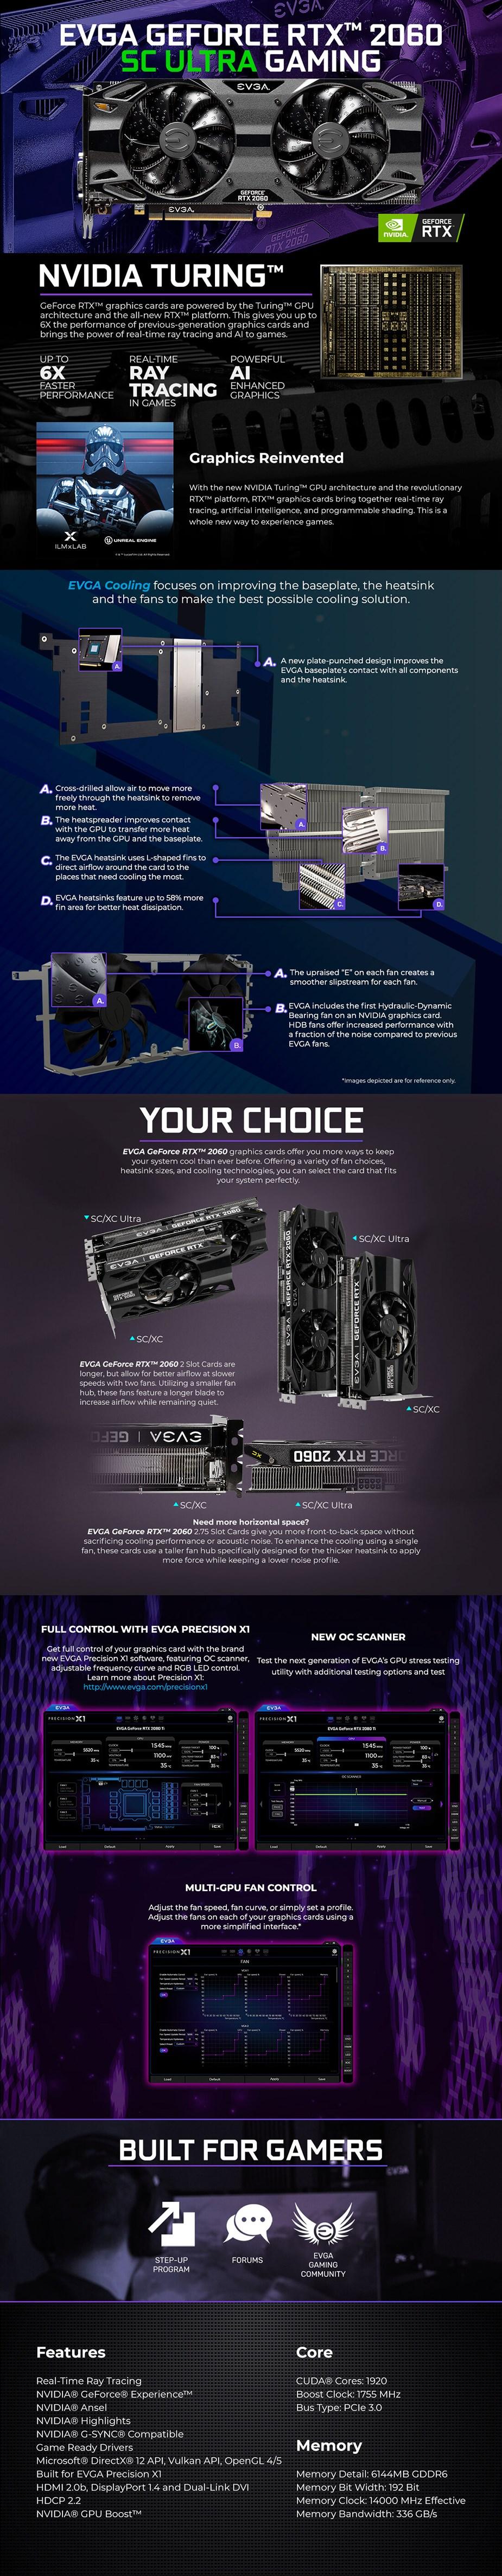 evga-geforce-rtx-2060-sc-ultra-gaming-6gb-video-card-ac28234-5.jpg